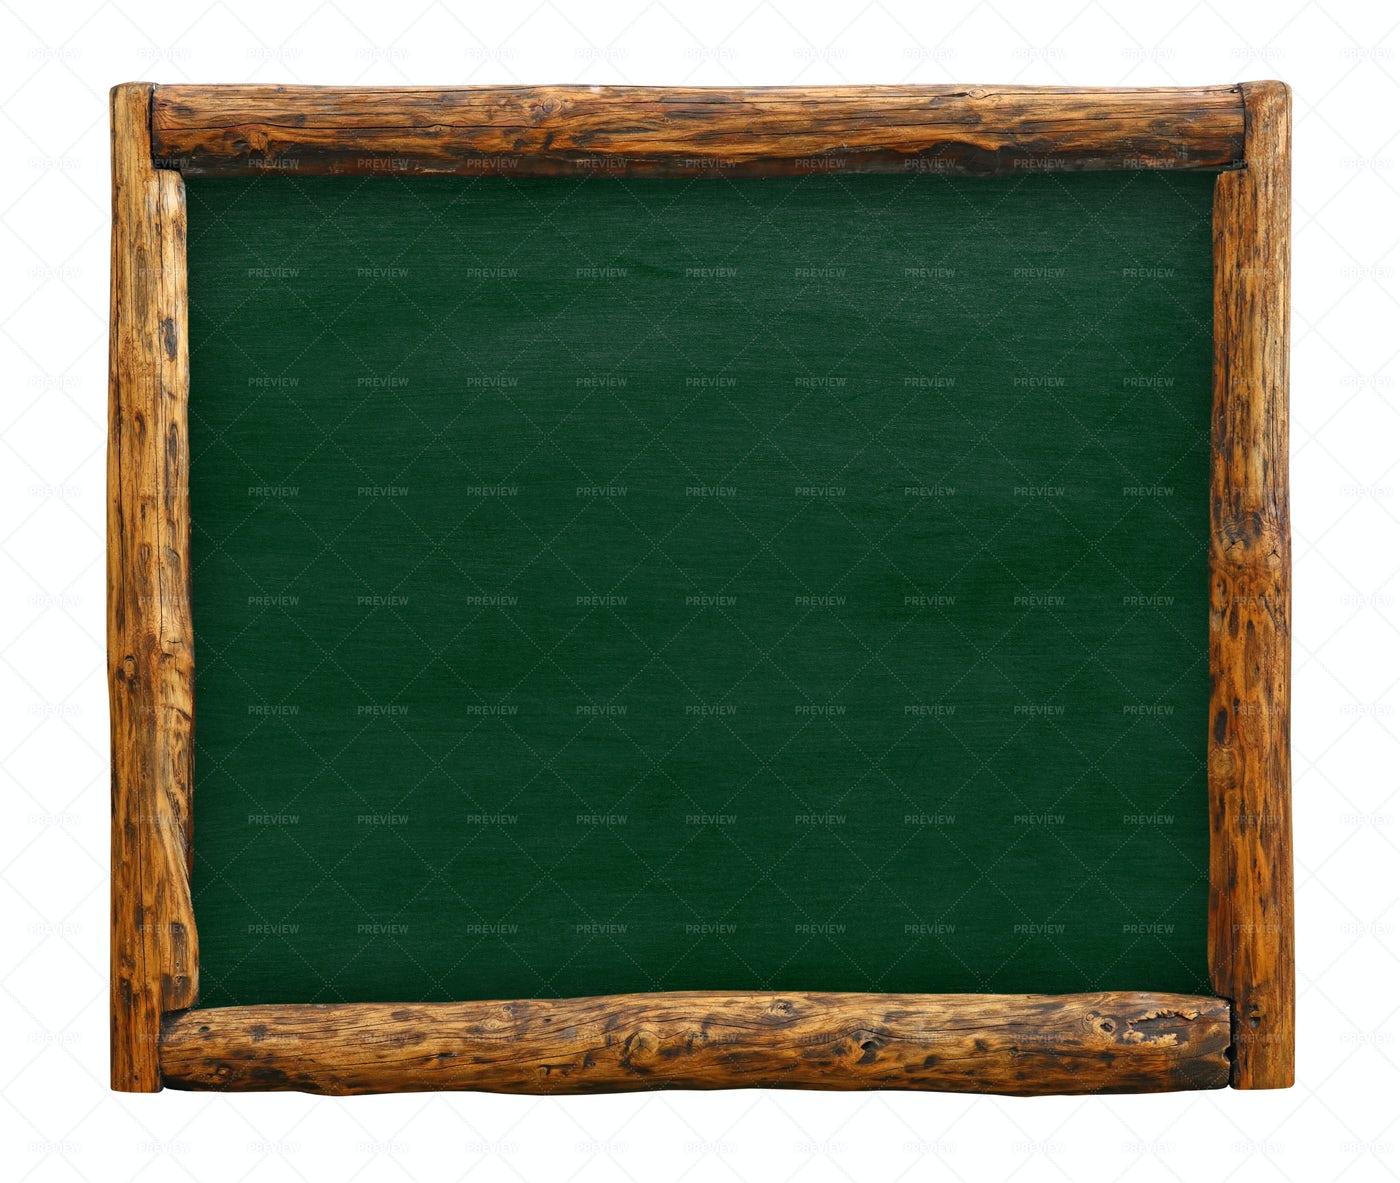 Green Chalkboard Sign: Stock Photos